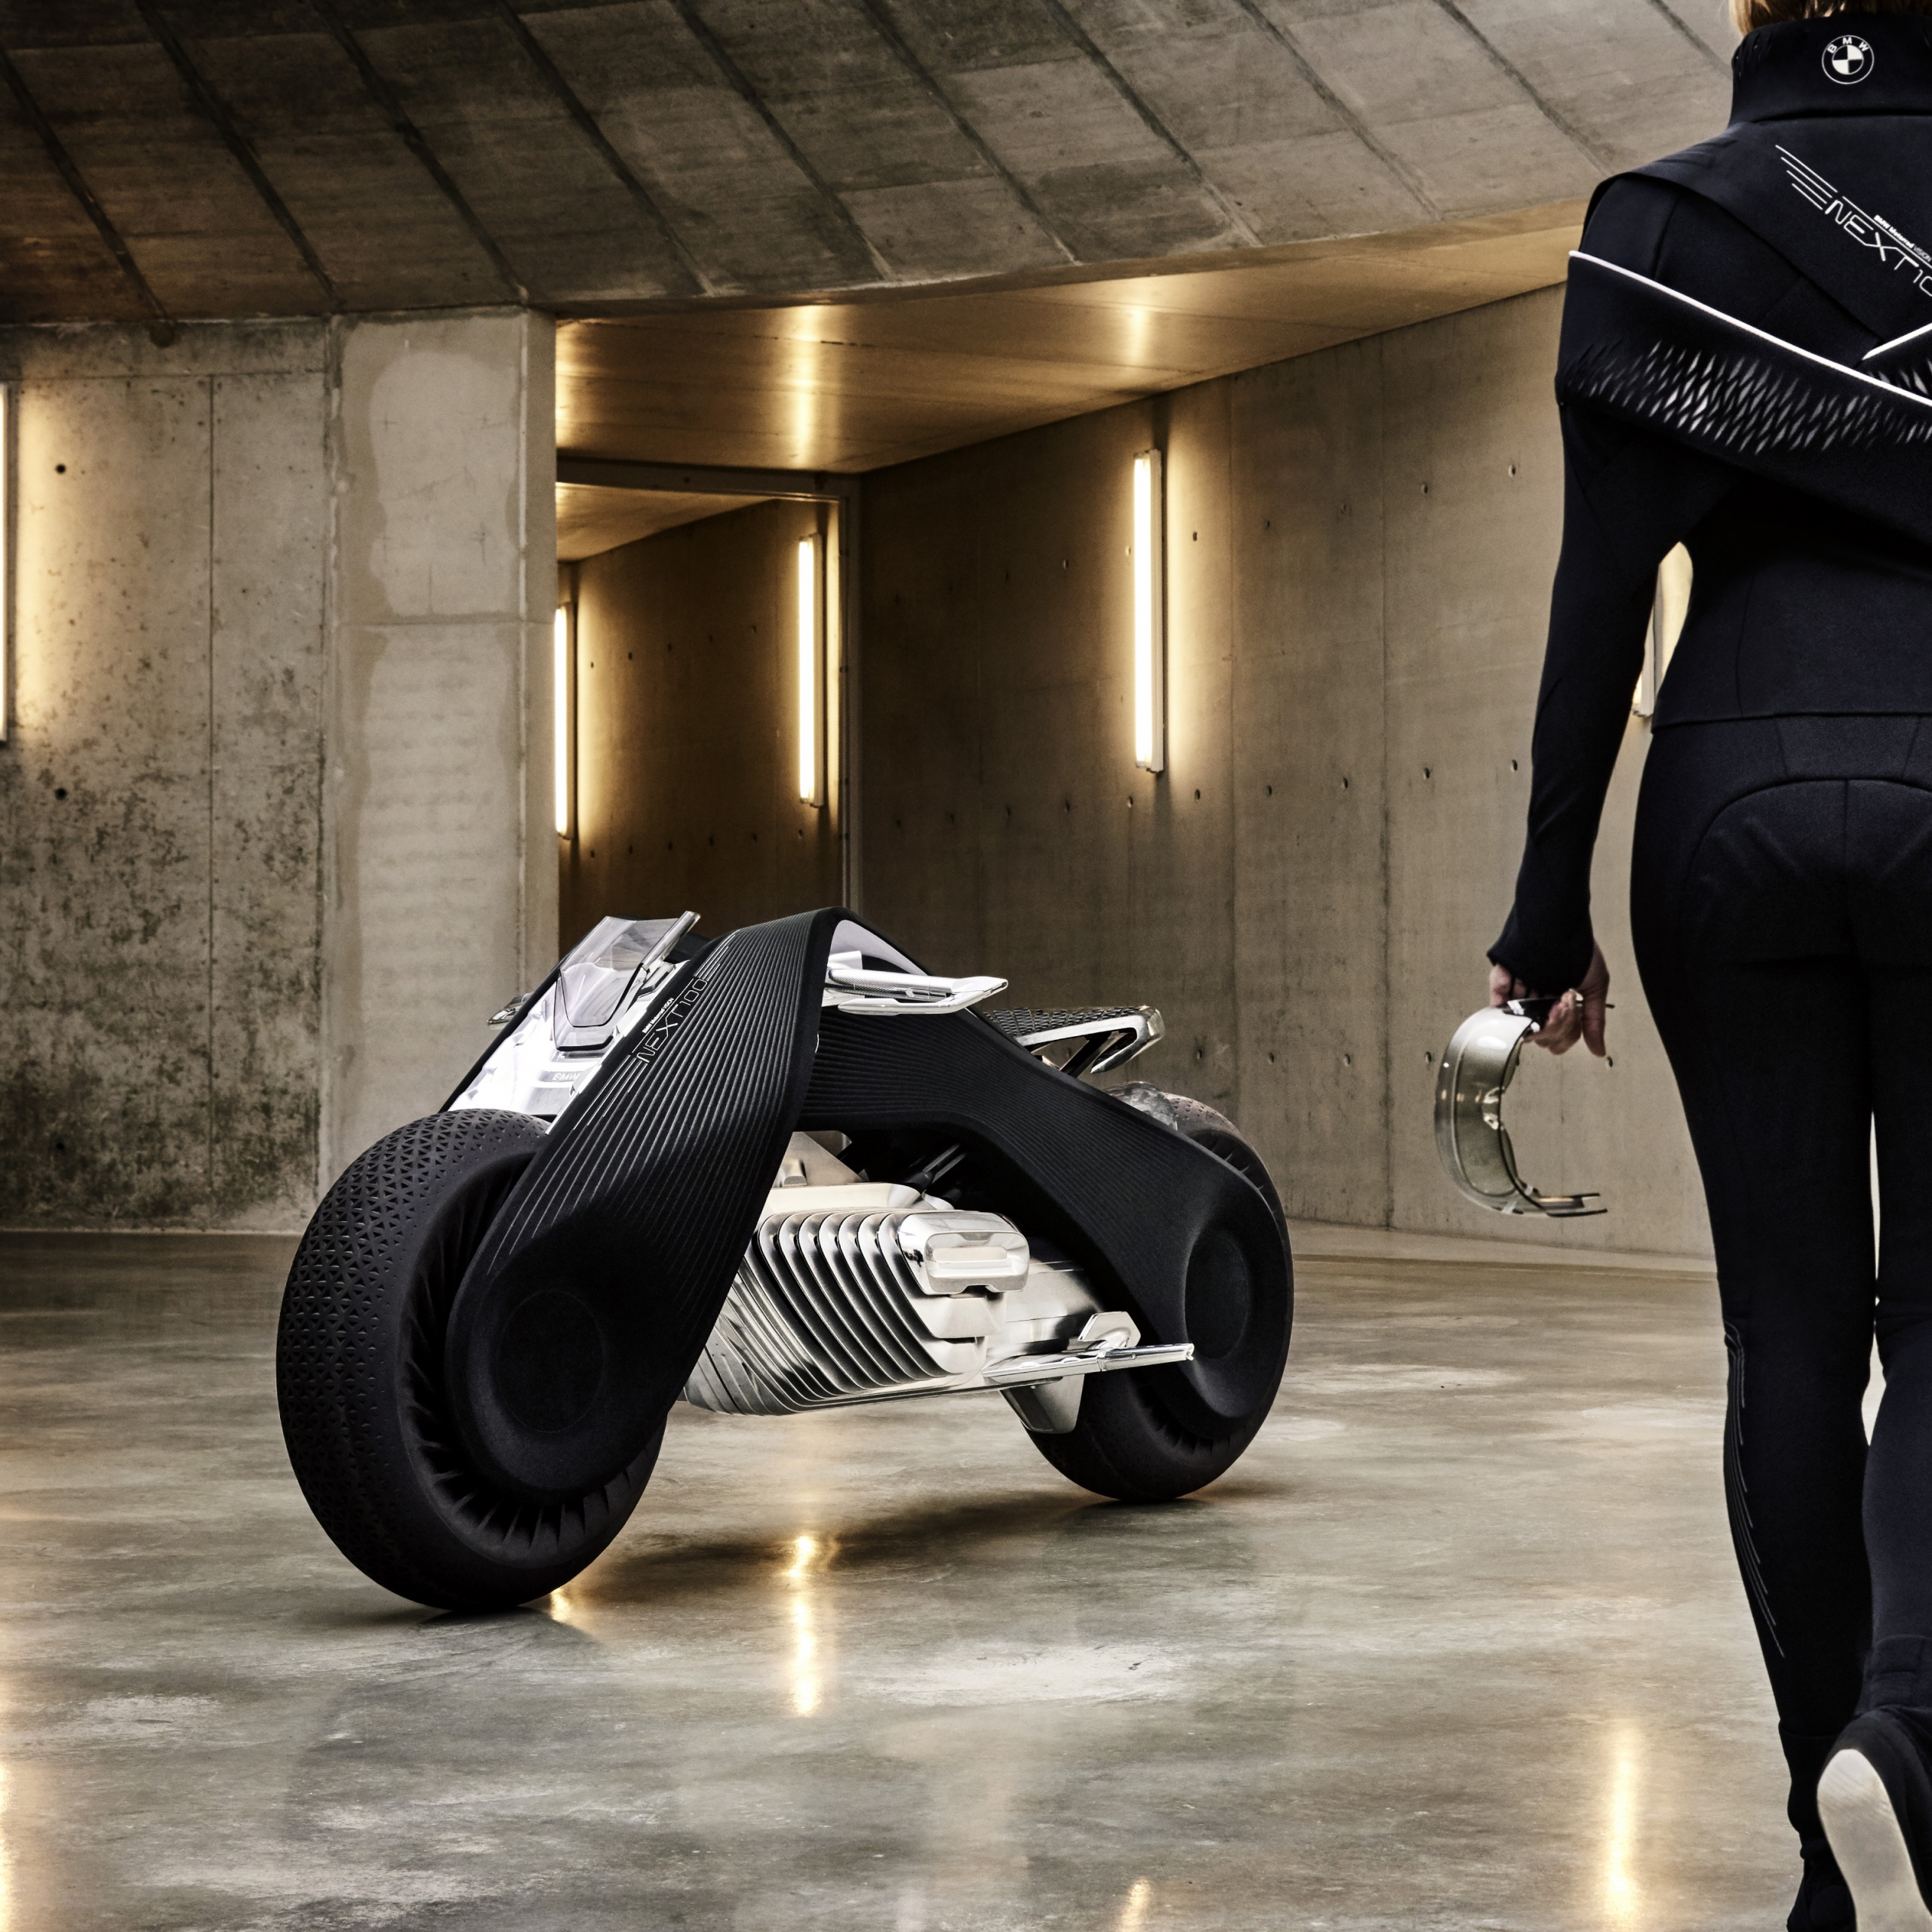 4K Wallpaper BMW VISION NEXT 100, Concept Bikes, Bikes, #889